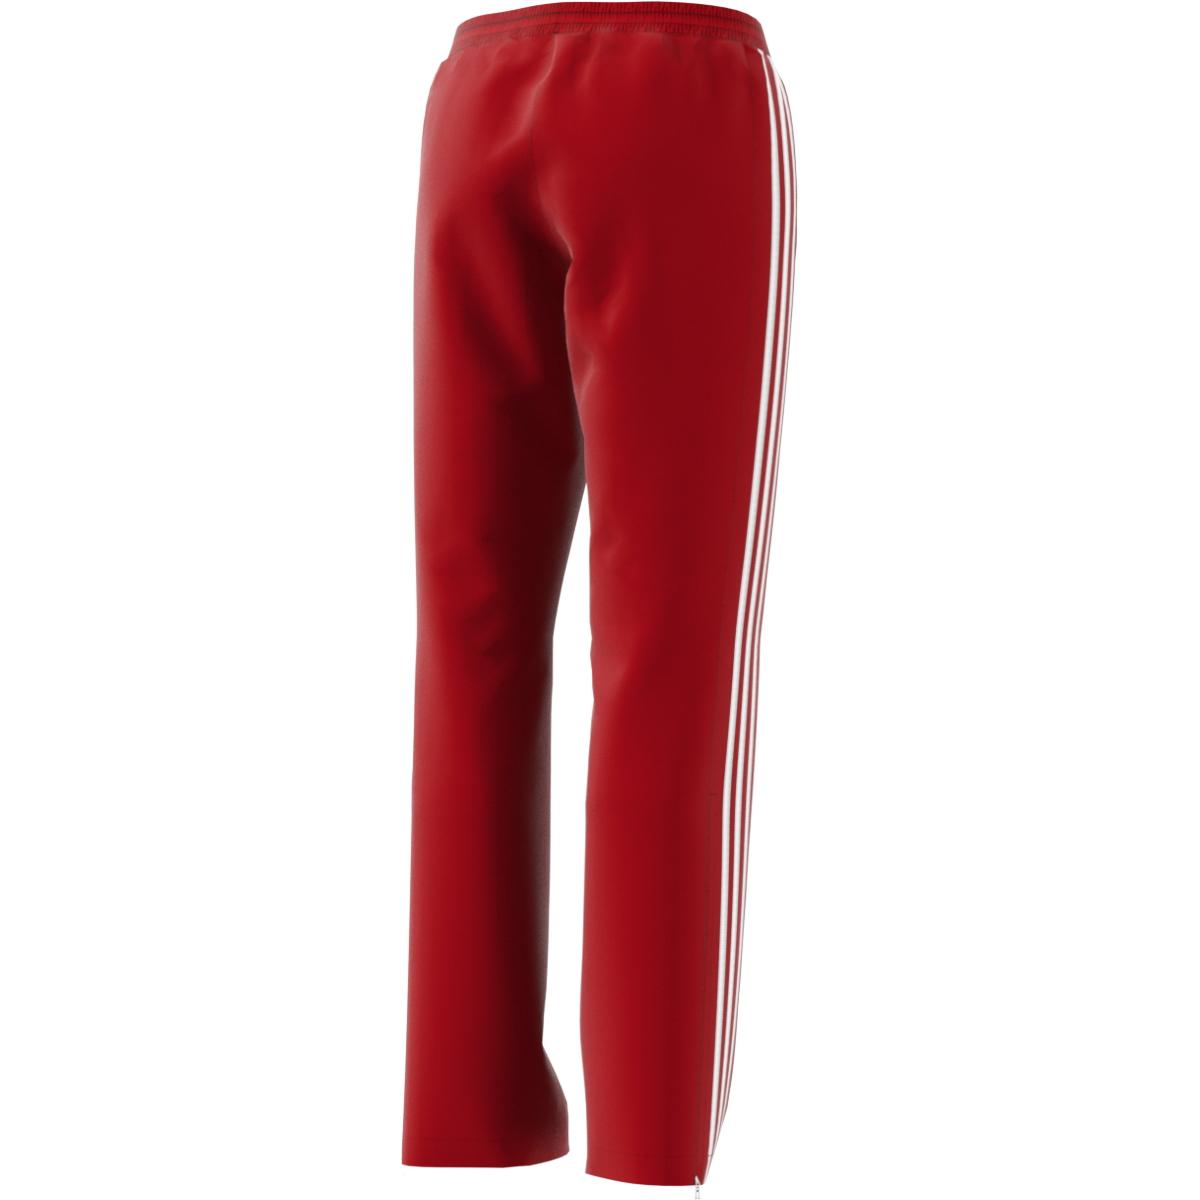 d8a27d0e1c3883 ... AJ5316 · Vorschau  adidas T16 Team Hose Damen power rot   weiß